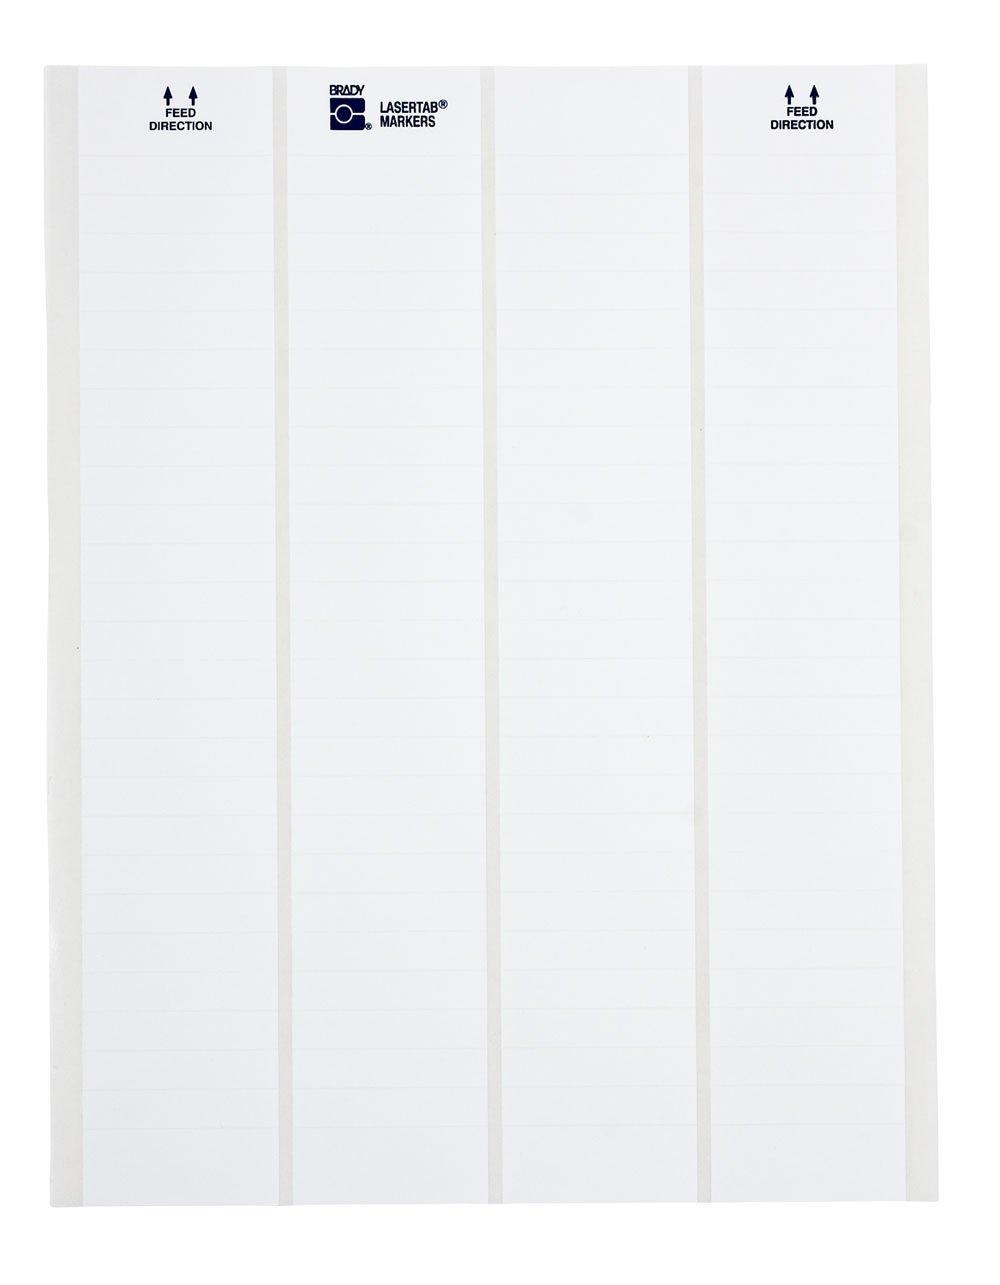 Brady LAT-3-747-10 0.65'' Width x 0.25'' Height, B-747 Permanent Polyester, Matte Finish White Lasertab Laser Printable Label (Pack of 10000)